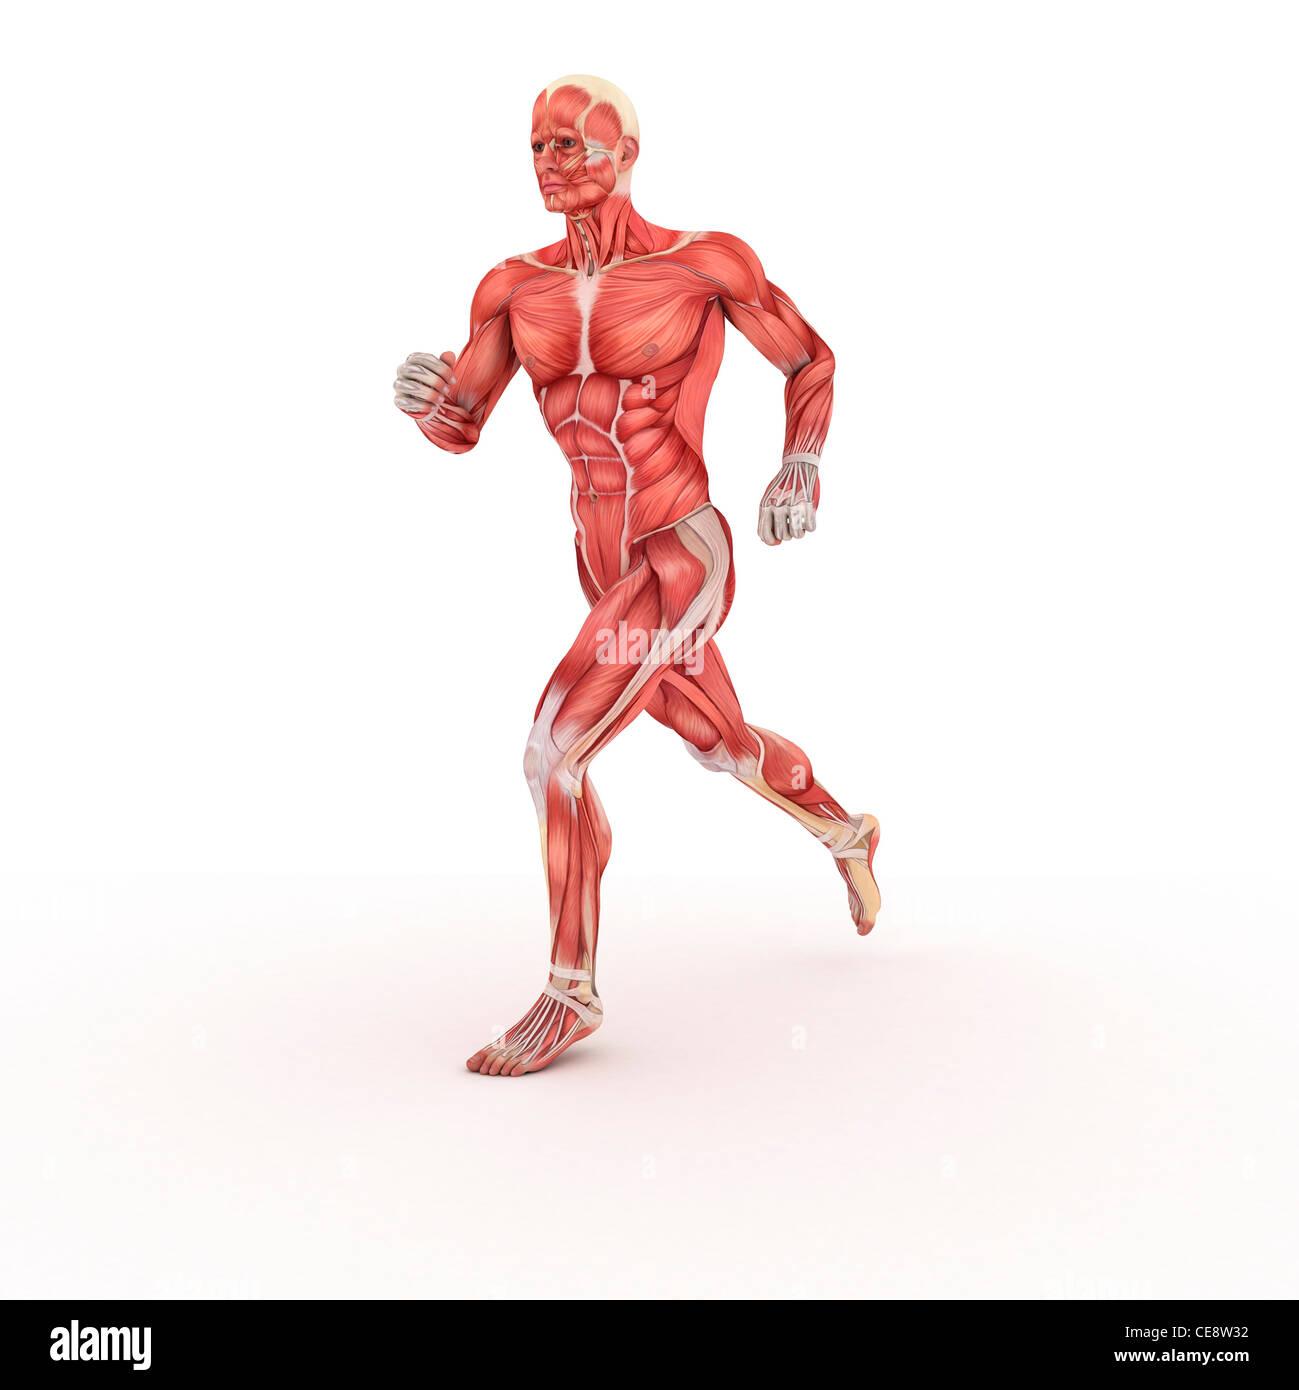 Body Muscle Anatomy Athlete Stockfotos & Body Muscle Anatomy Athlete ...